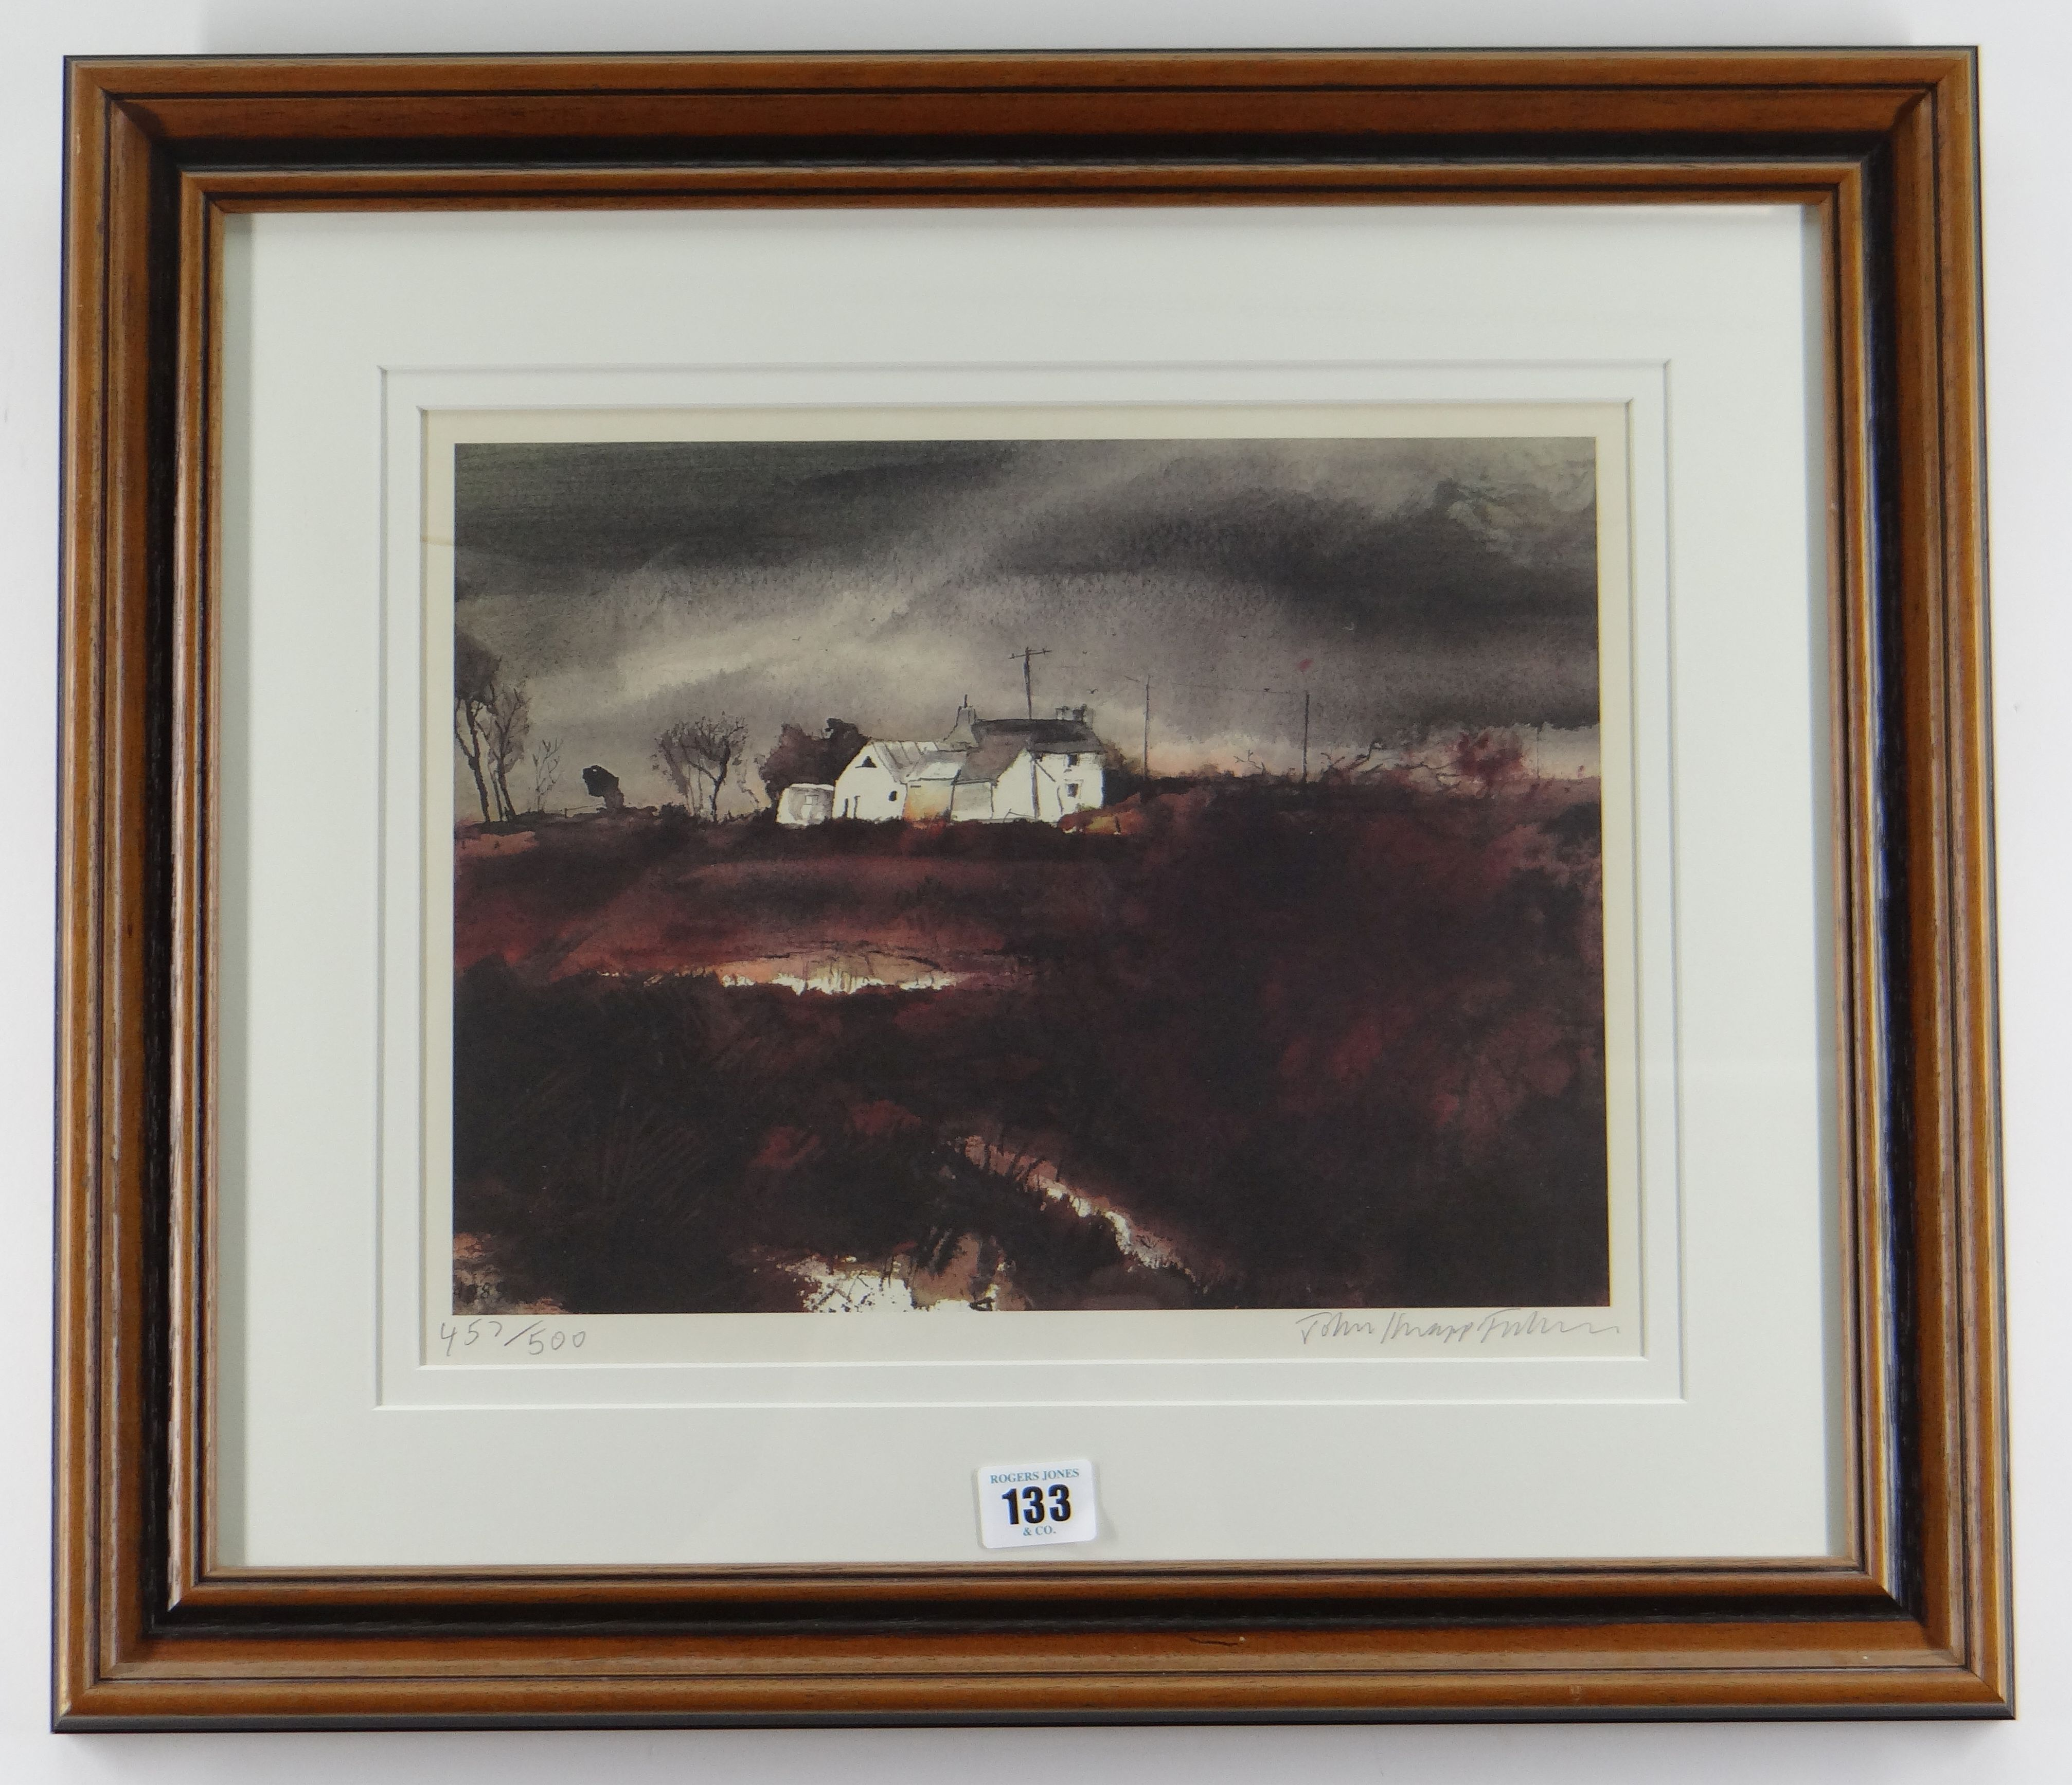 JOHN KNAPP-FISHER limited edition (457/500) print - entitled 'Farmhouse in Landscape', signed, 27 - Image 2 of 2